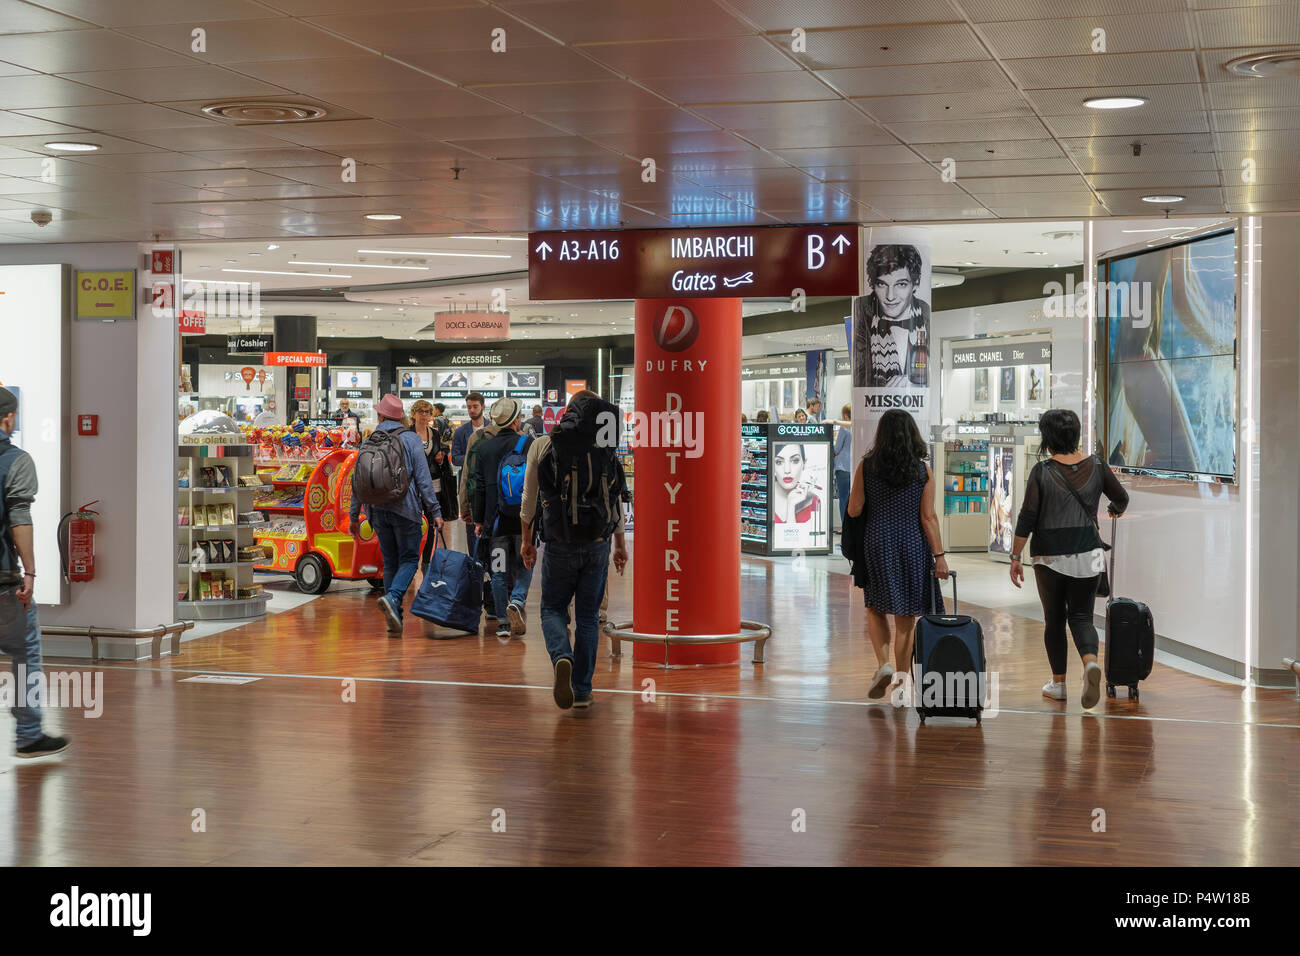 Aeroporto Orio : Transfer da aeroporto bergamo orio al serio per verona venezia